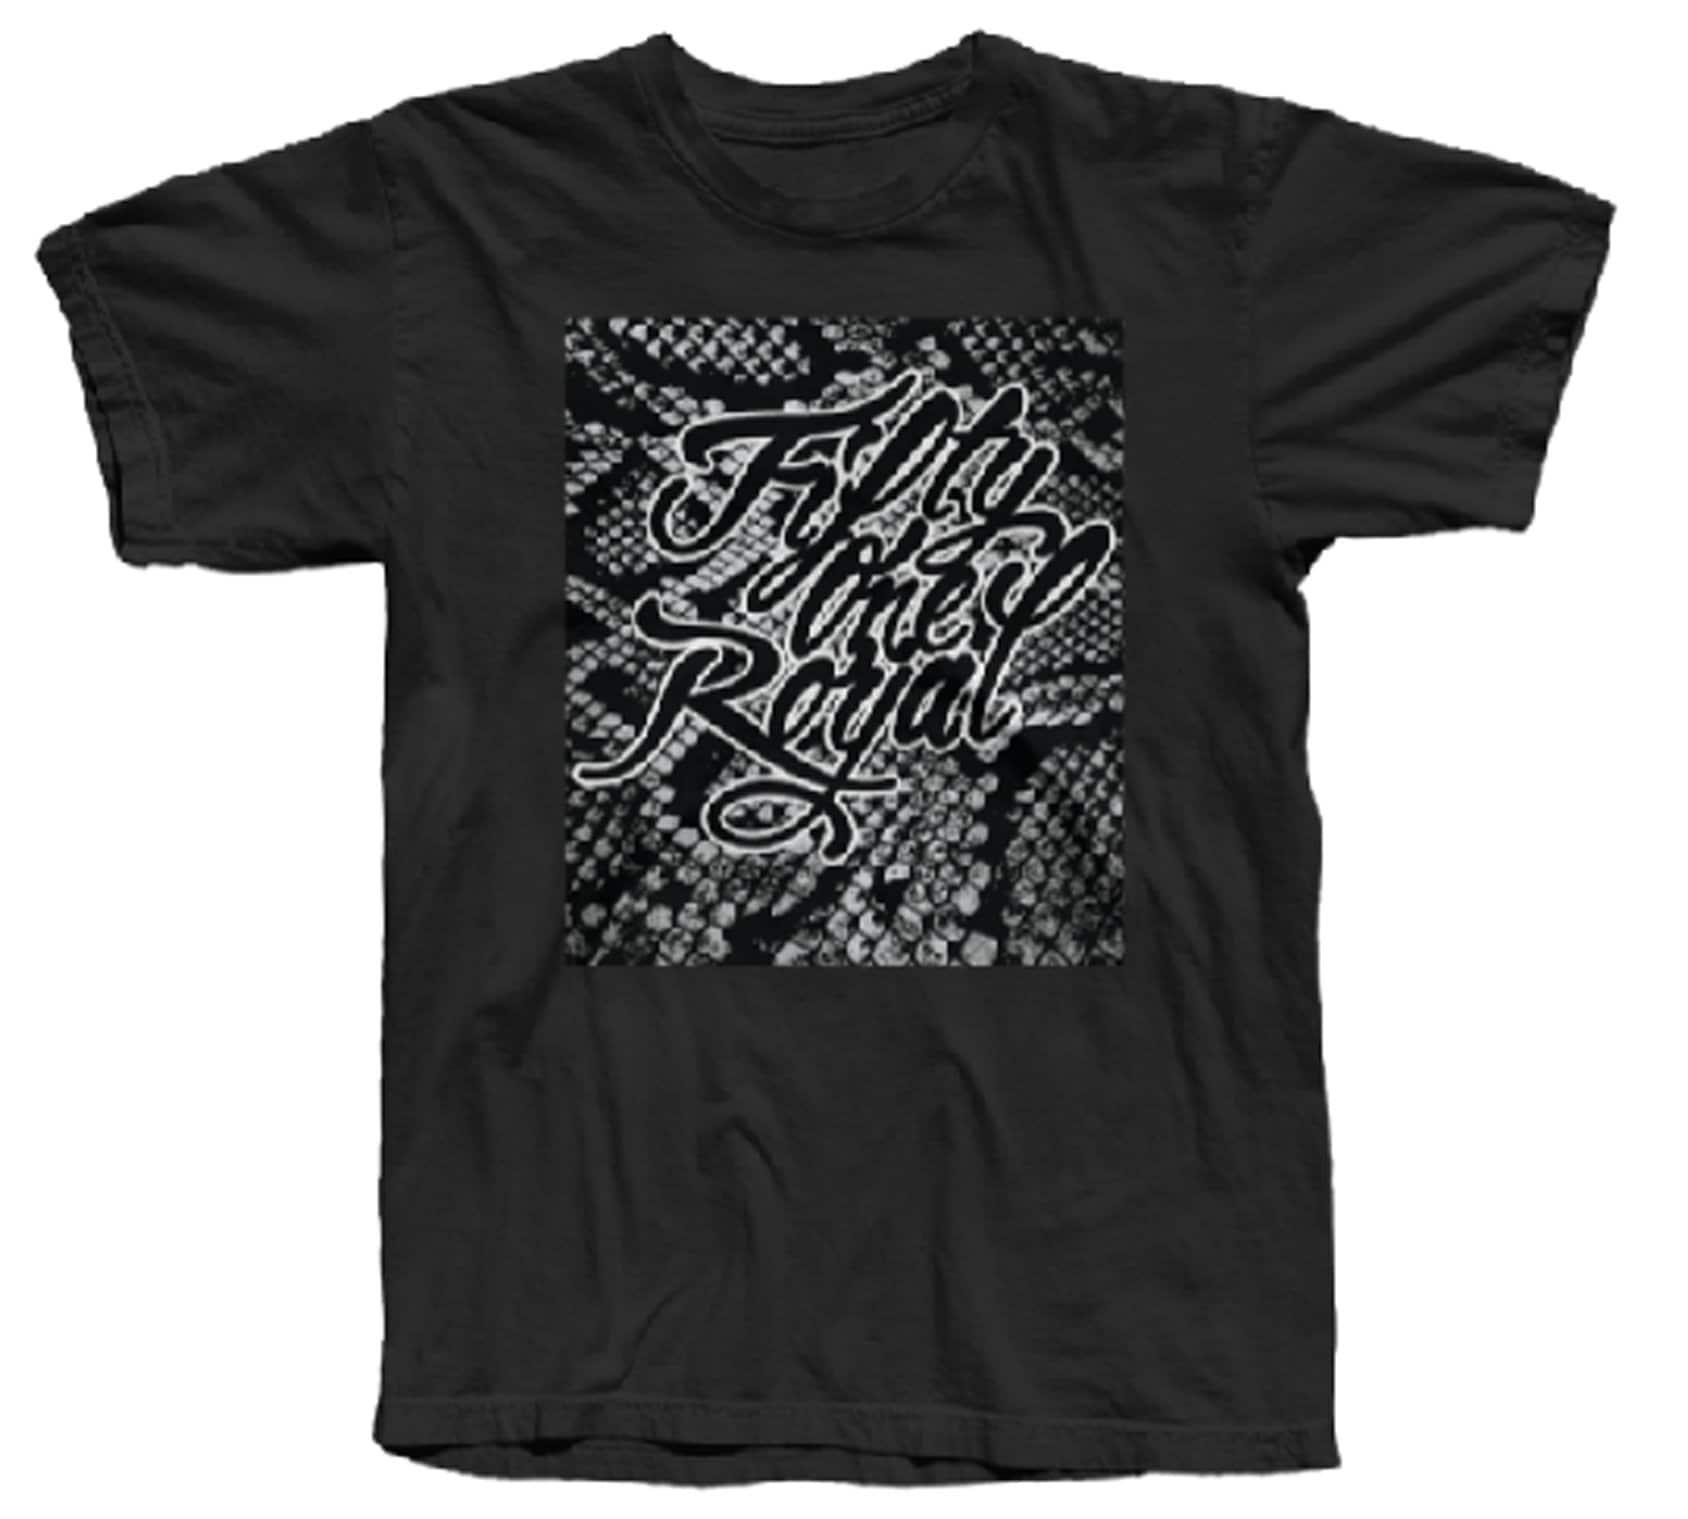 90s Hip Hop Clothing Versace T Shirt Kawai Clothing Supreme Etsy